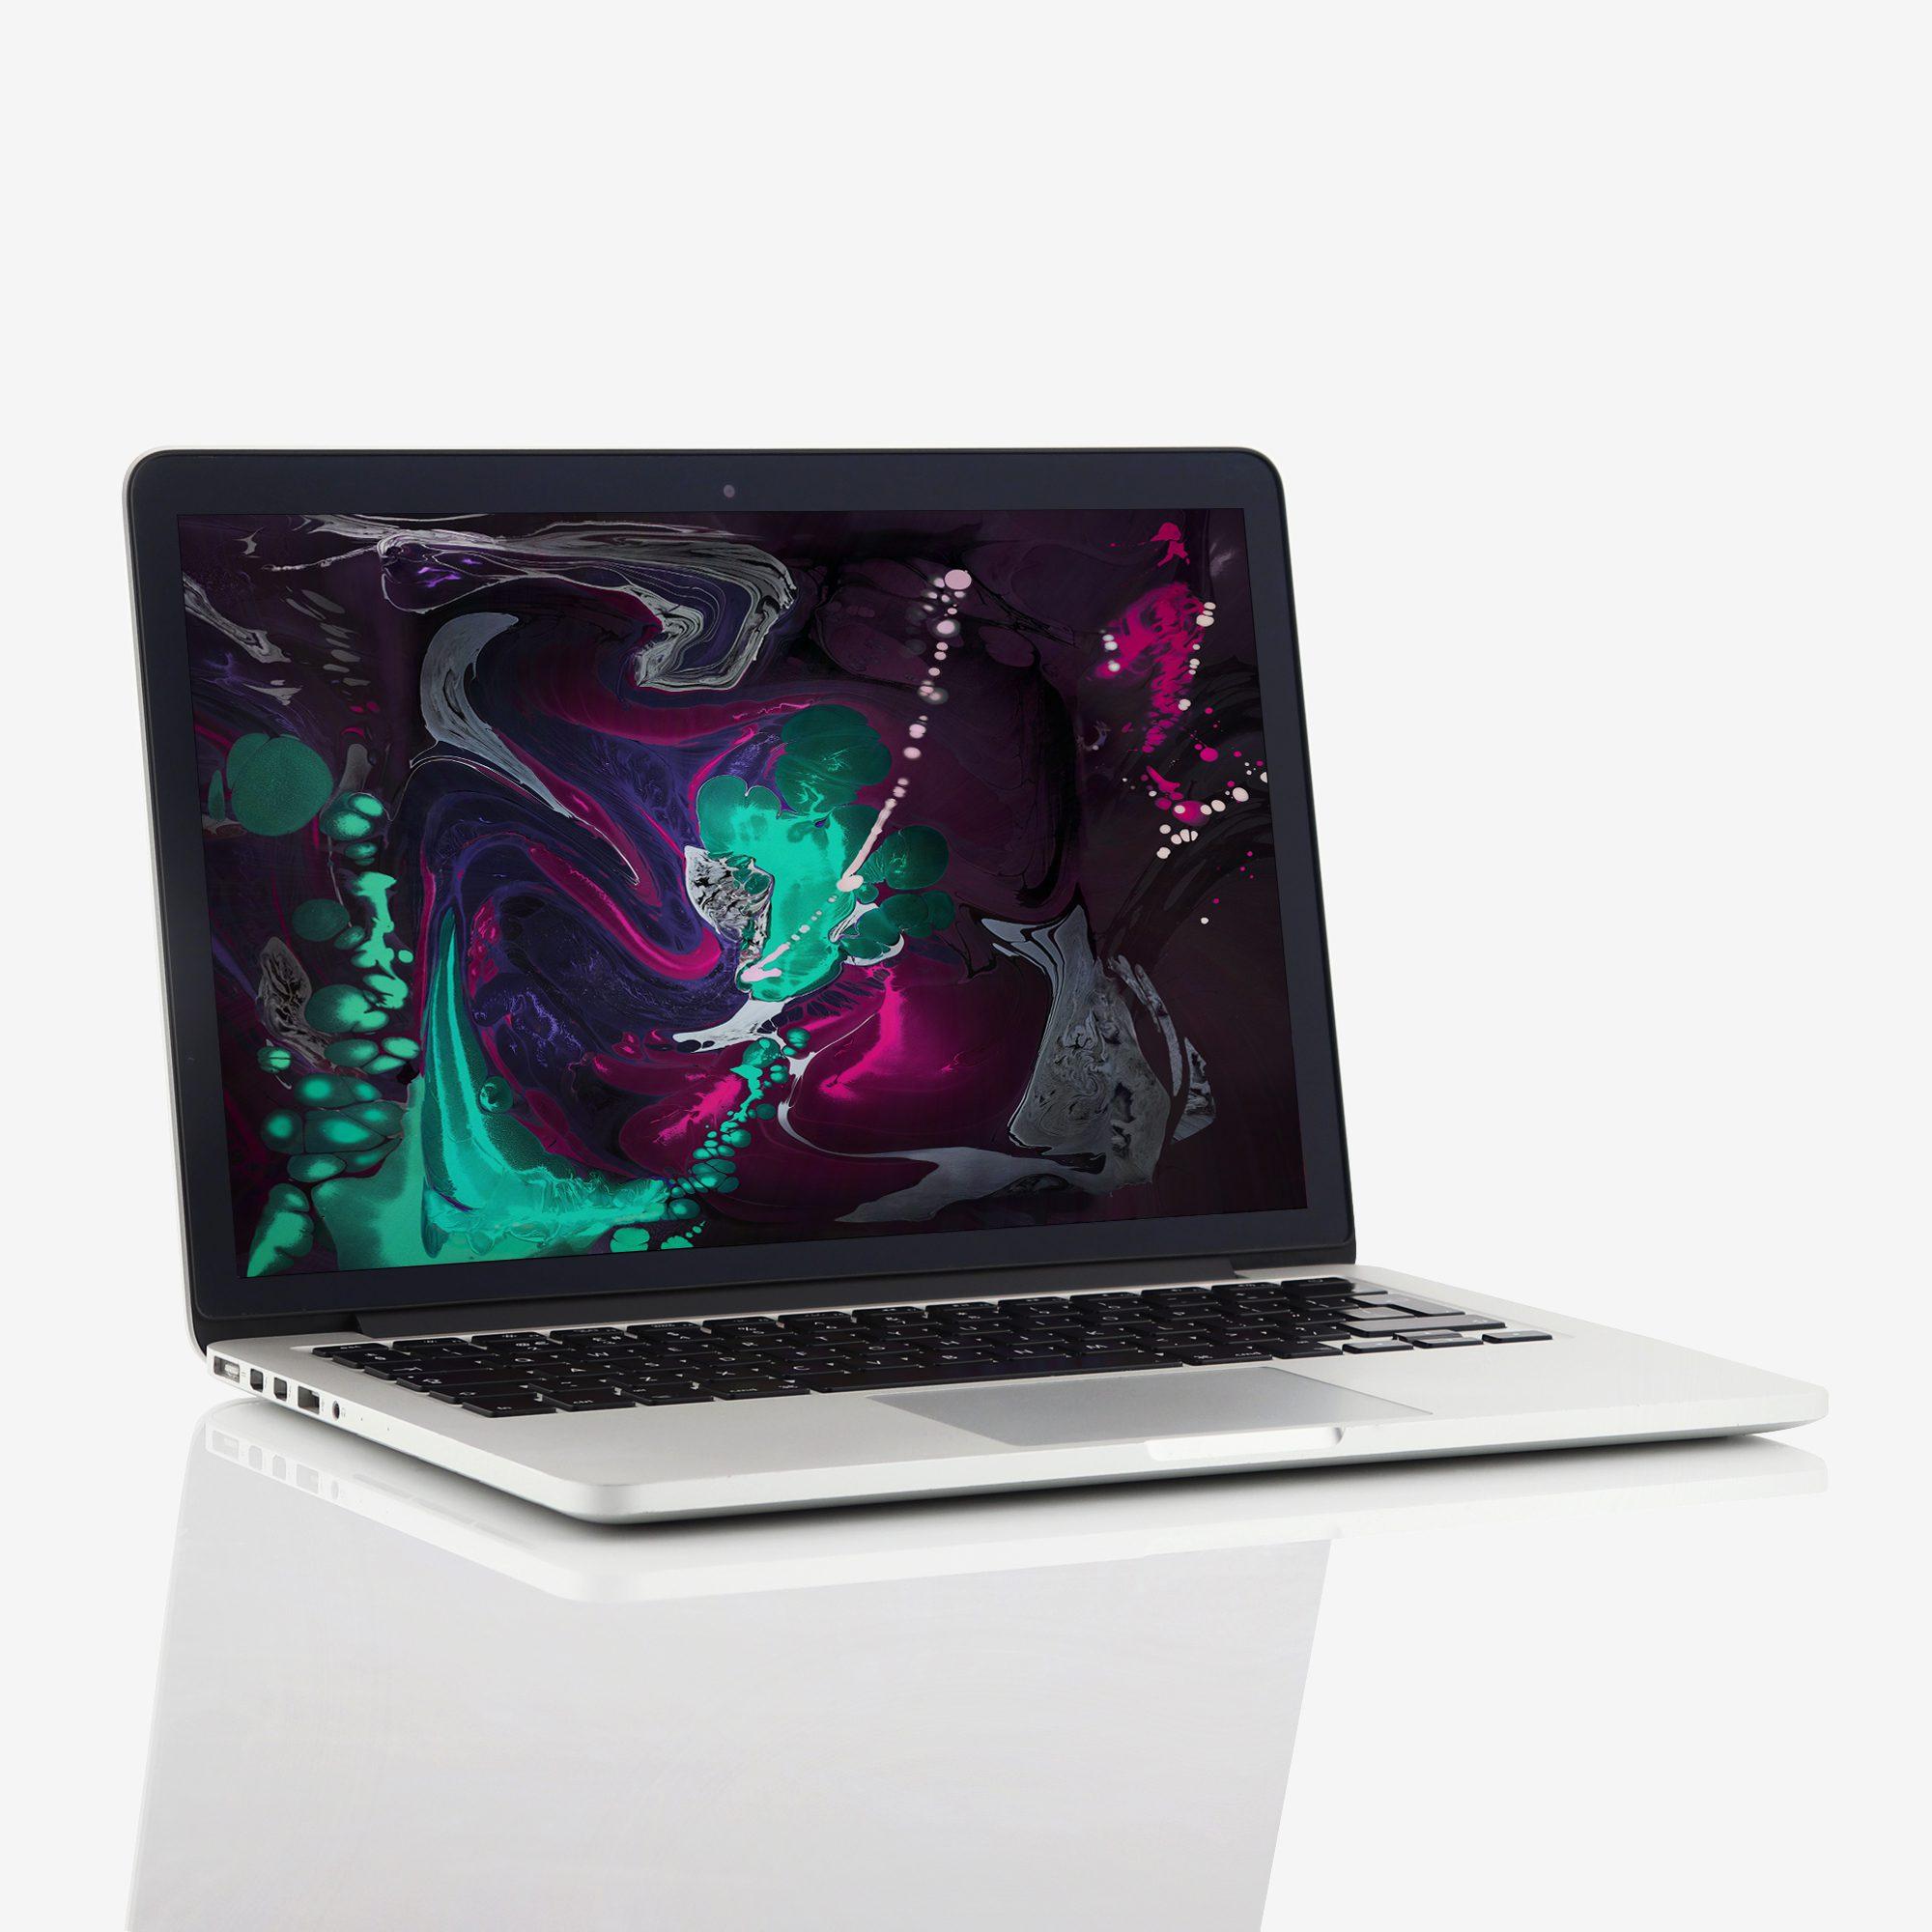 1 x Apple MacBook Pro Retina 13 Inch Intel Core i5 2.40 GHz (2013)